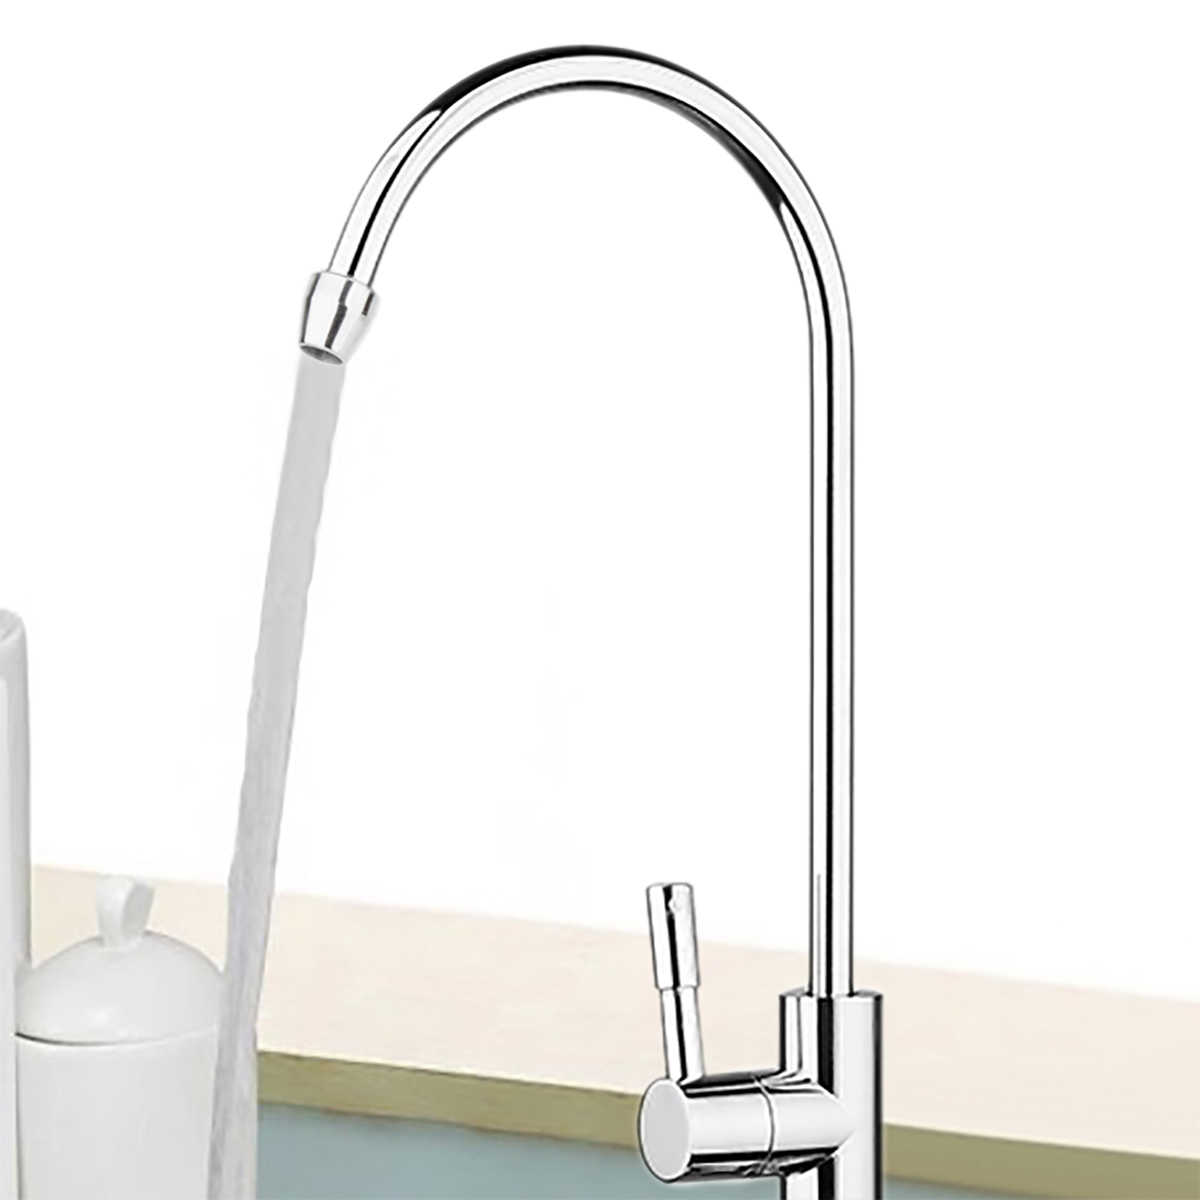 "1pc Nieuwe Drinkwater Kraan 1/4 ""360 Graden Chrome Osmose Drinkwater RO Water Filter Kraan Afwerking Reverse Sink"